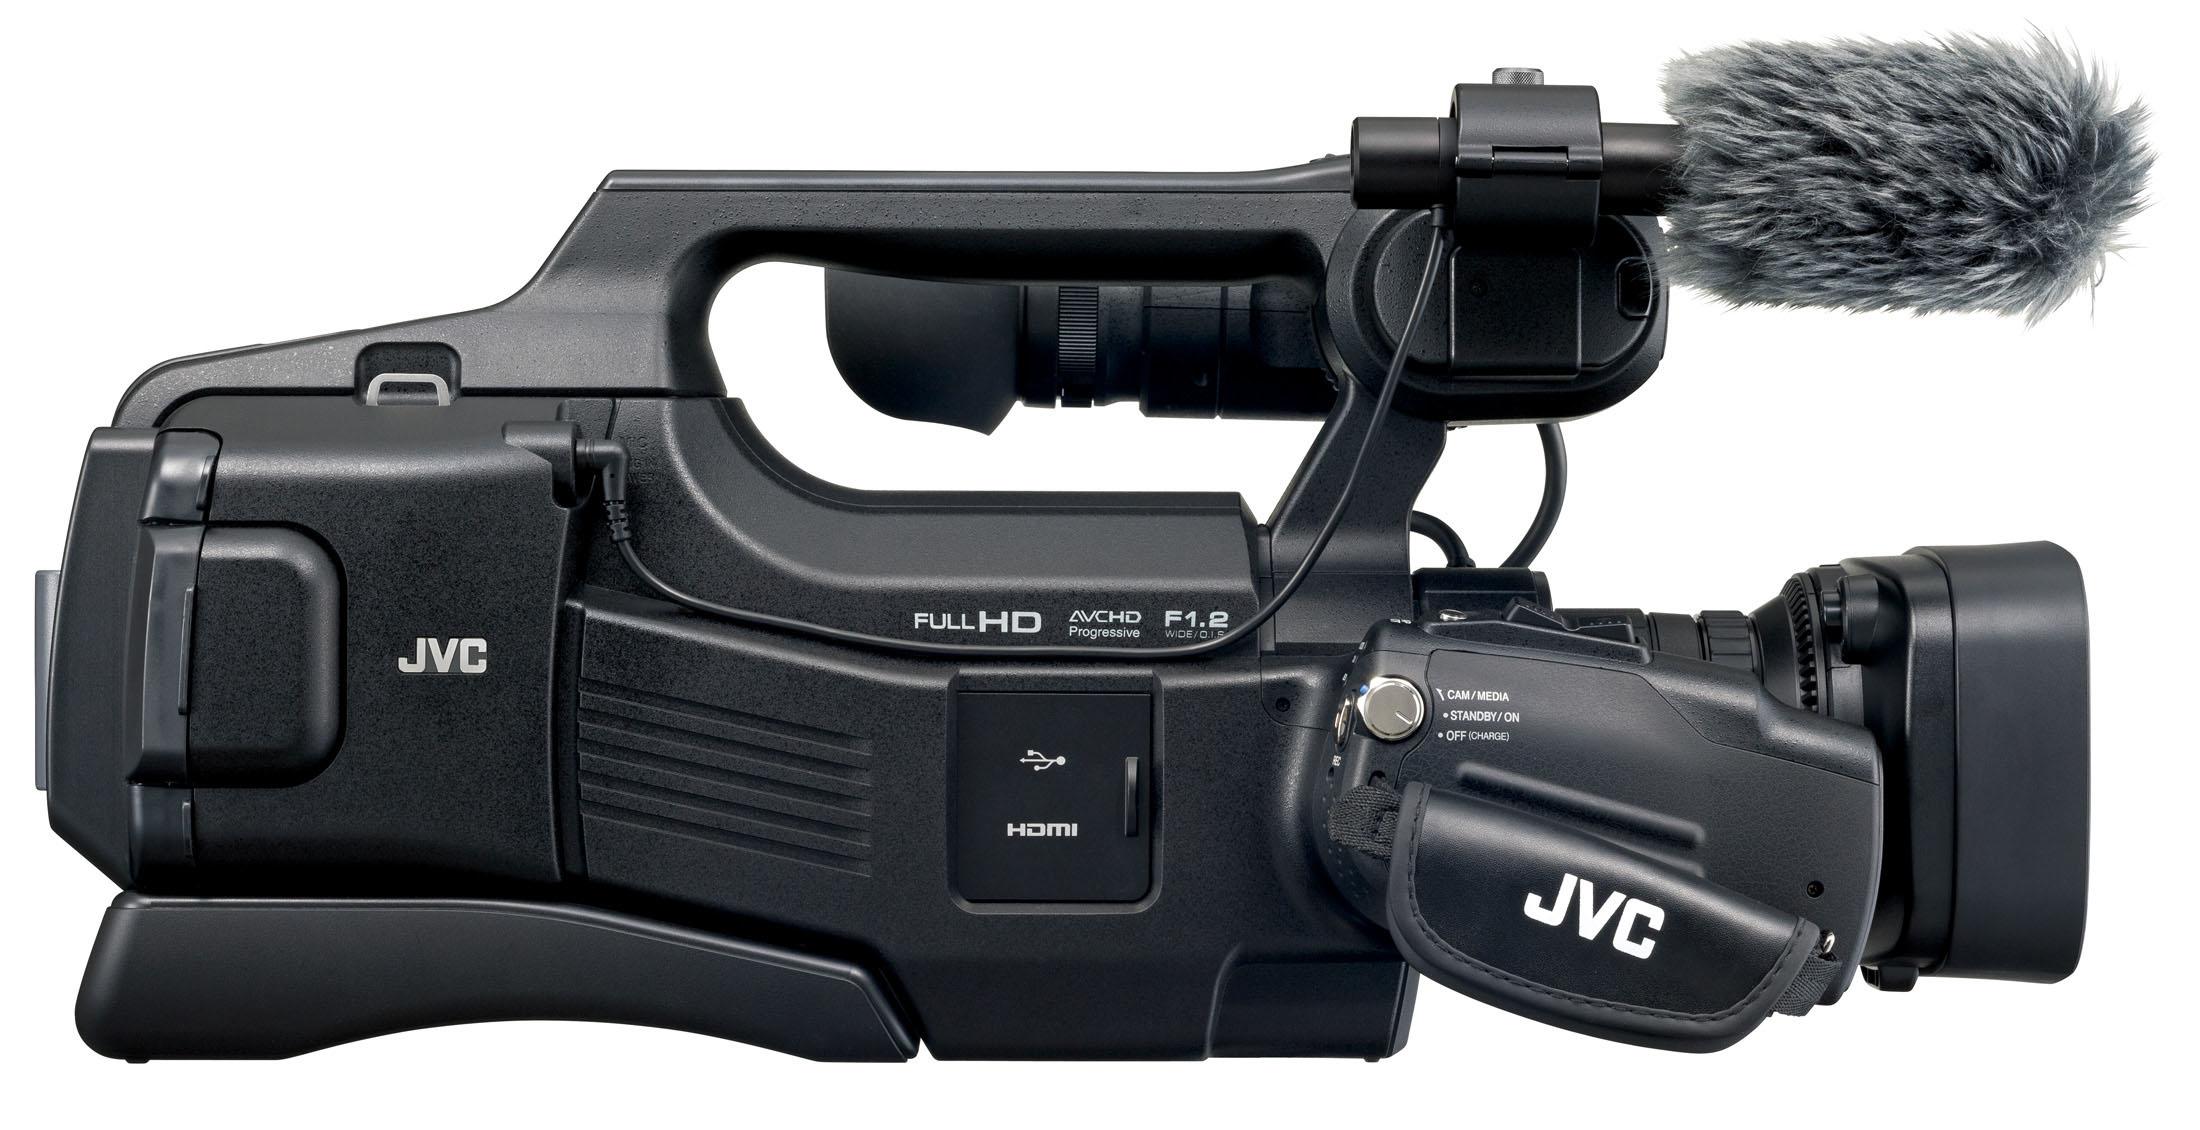 JVC GY-HM70E videocamera 12 MP CMOS Shoulder camcorder Nero Full HD